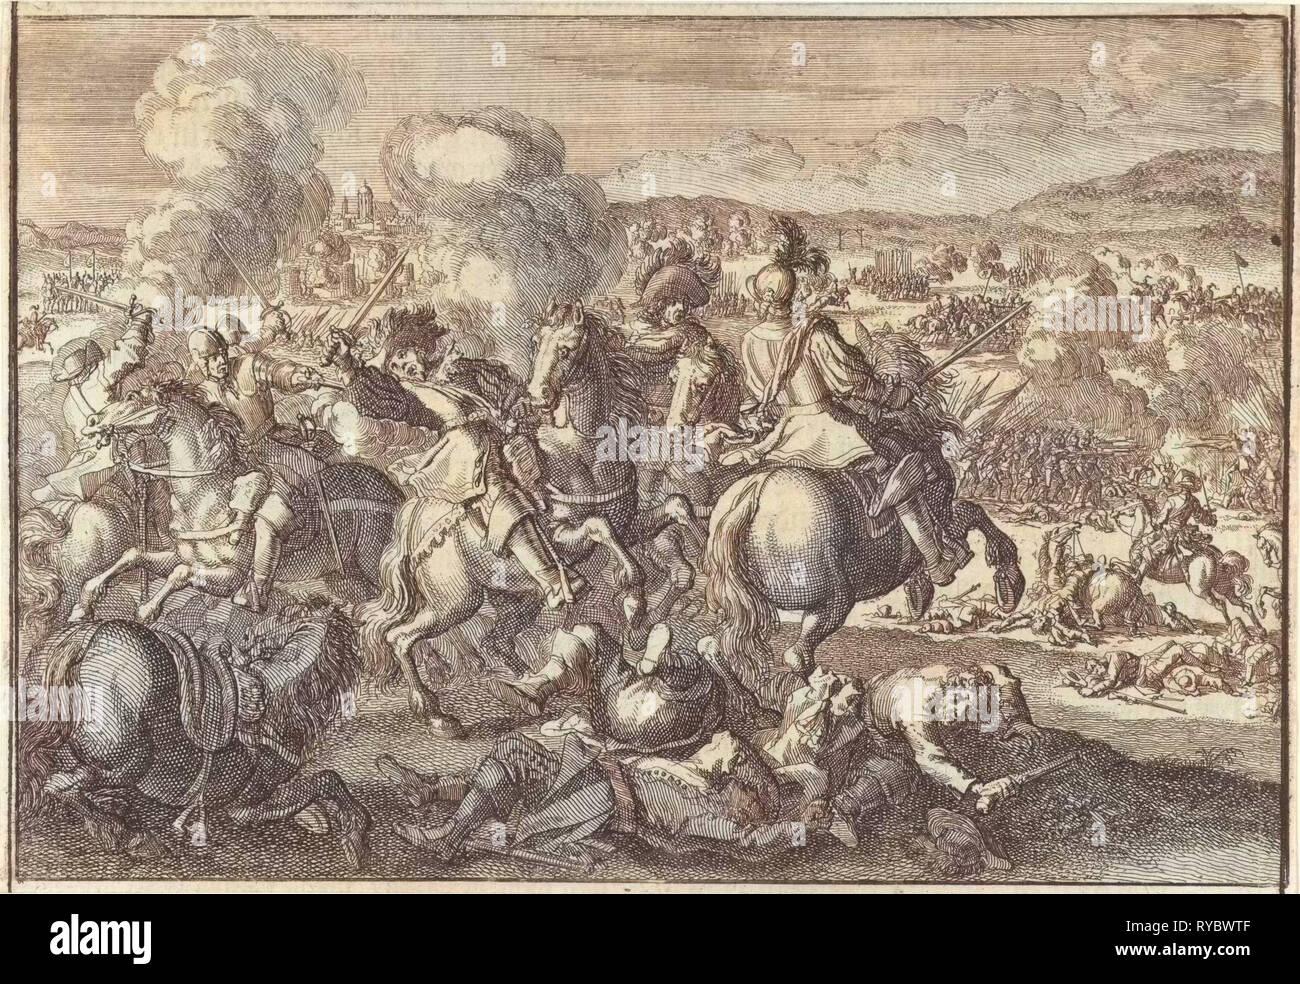 Death of King Gustavus Adolphus of Sweden at the Battle of Lutzen, southwest of Leipzig, Germany, 1632, Johann David Zunnern, 1701 - Stock Image